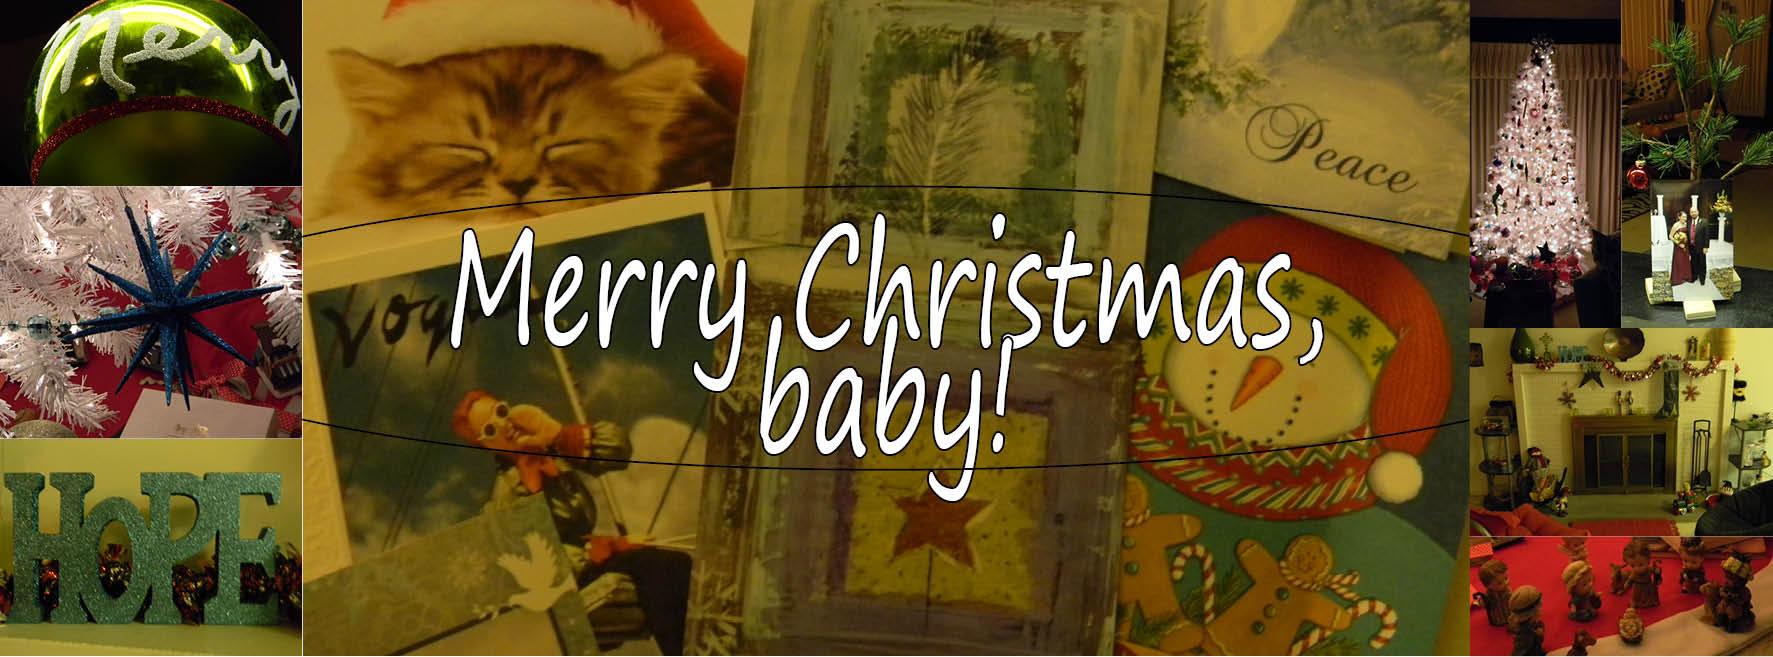 Merry Christmas, baby!